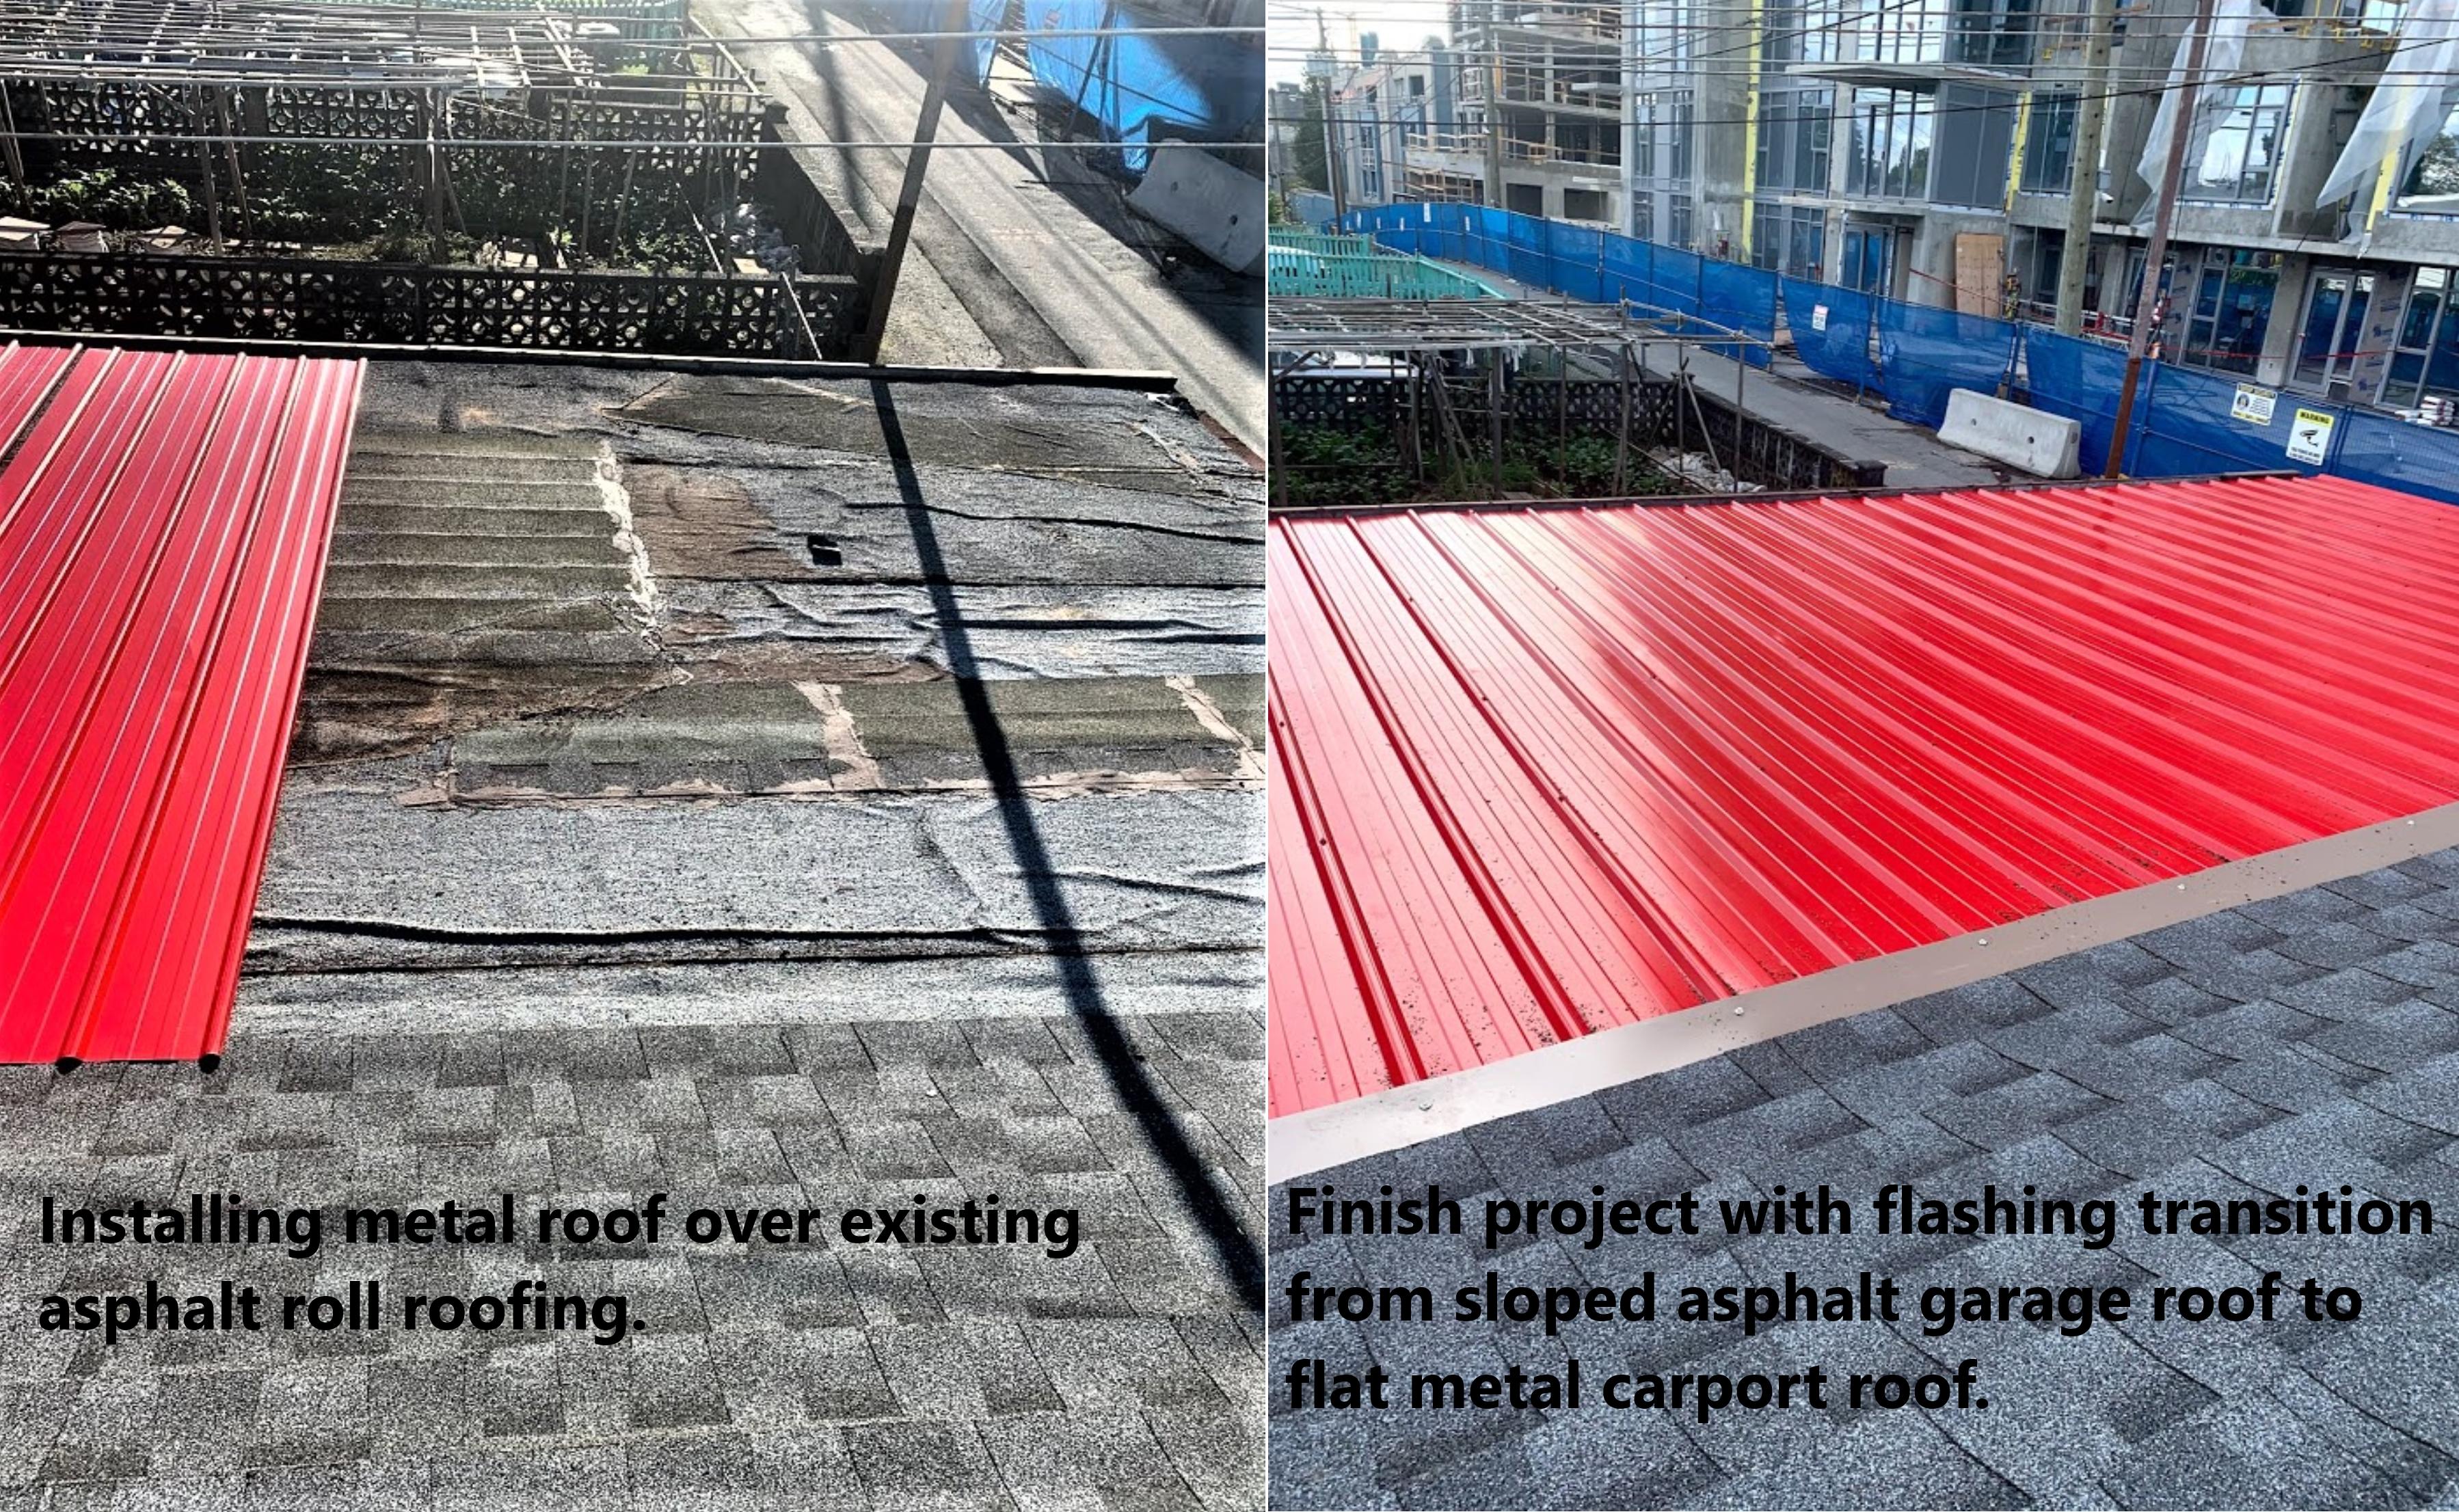 New metal roof installed over existing asphalt roll shingle flat carport roof.